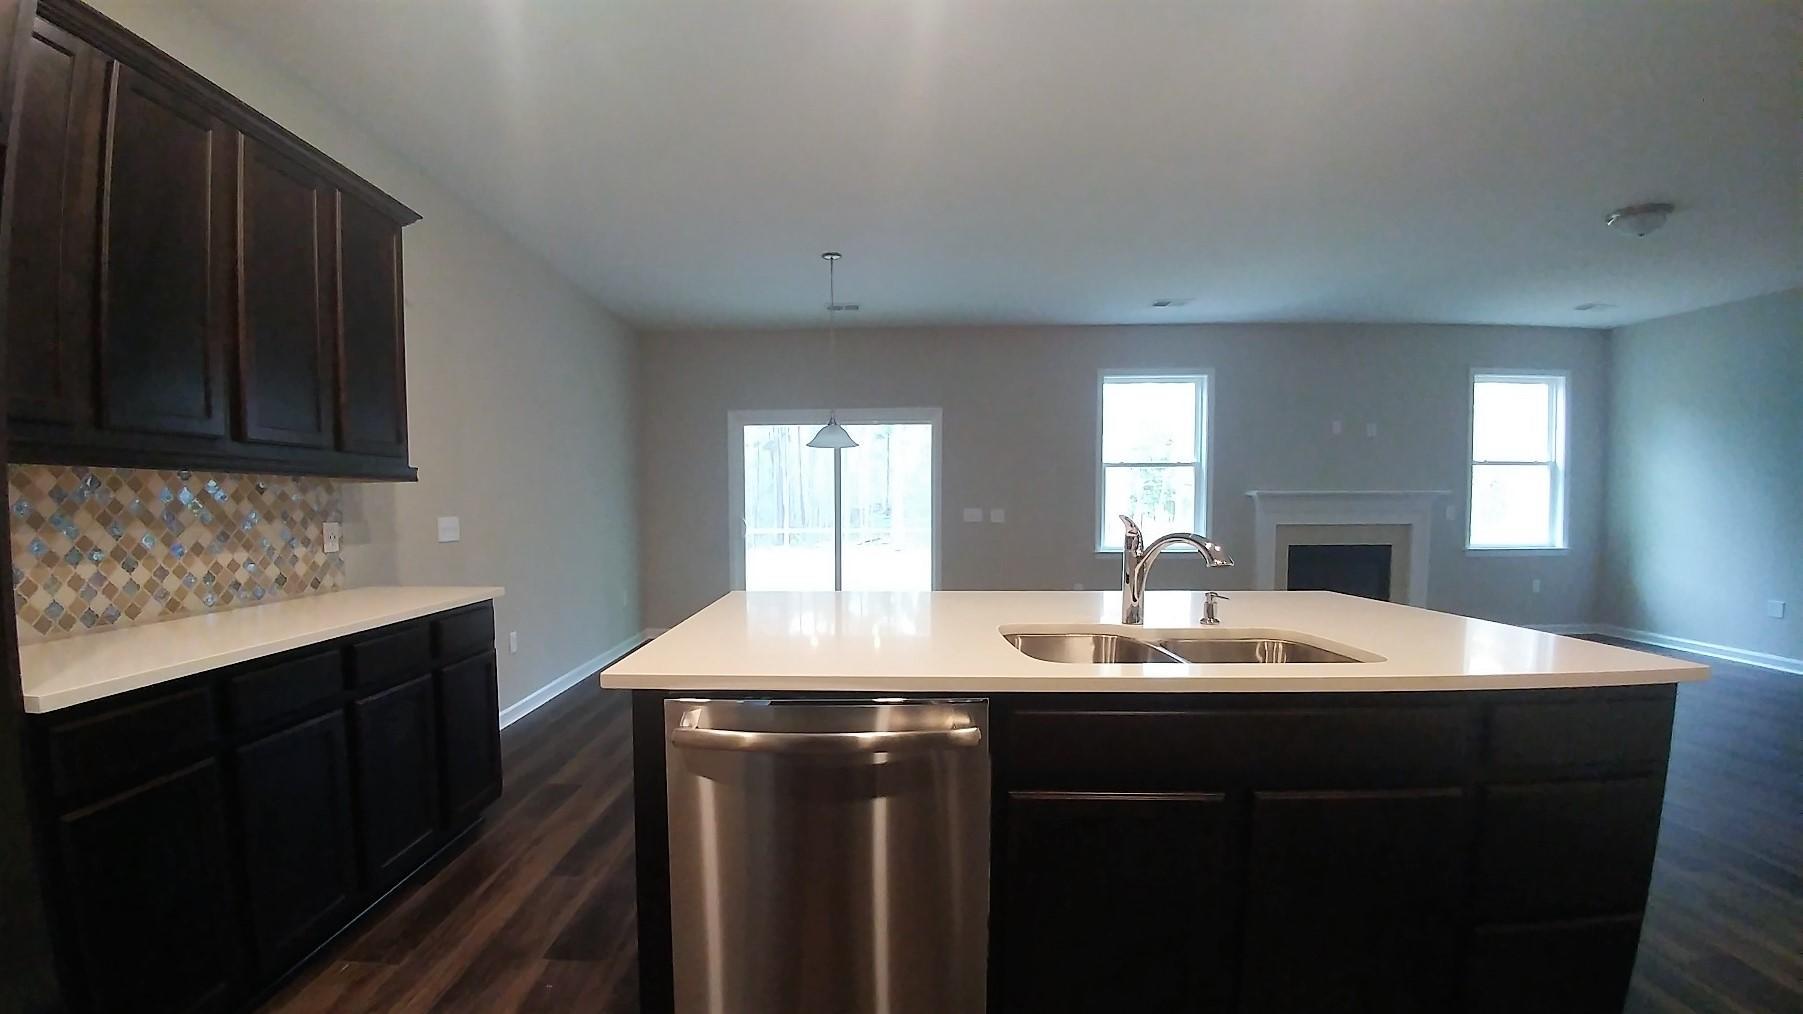 Carolina Bay Homes For Sale - 2008 Tacoma, Ridgeville, SC - 11